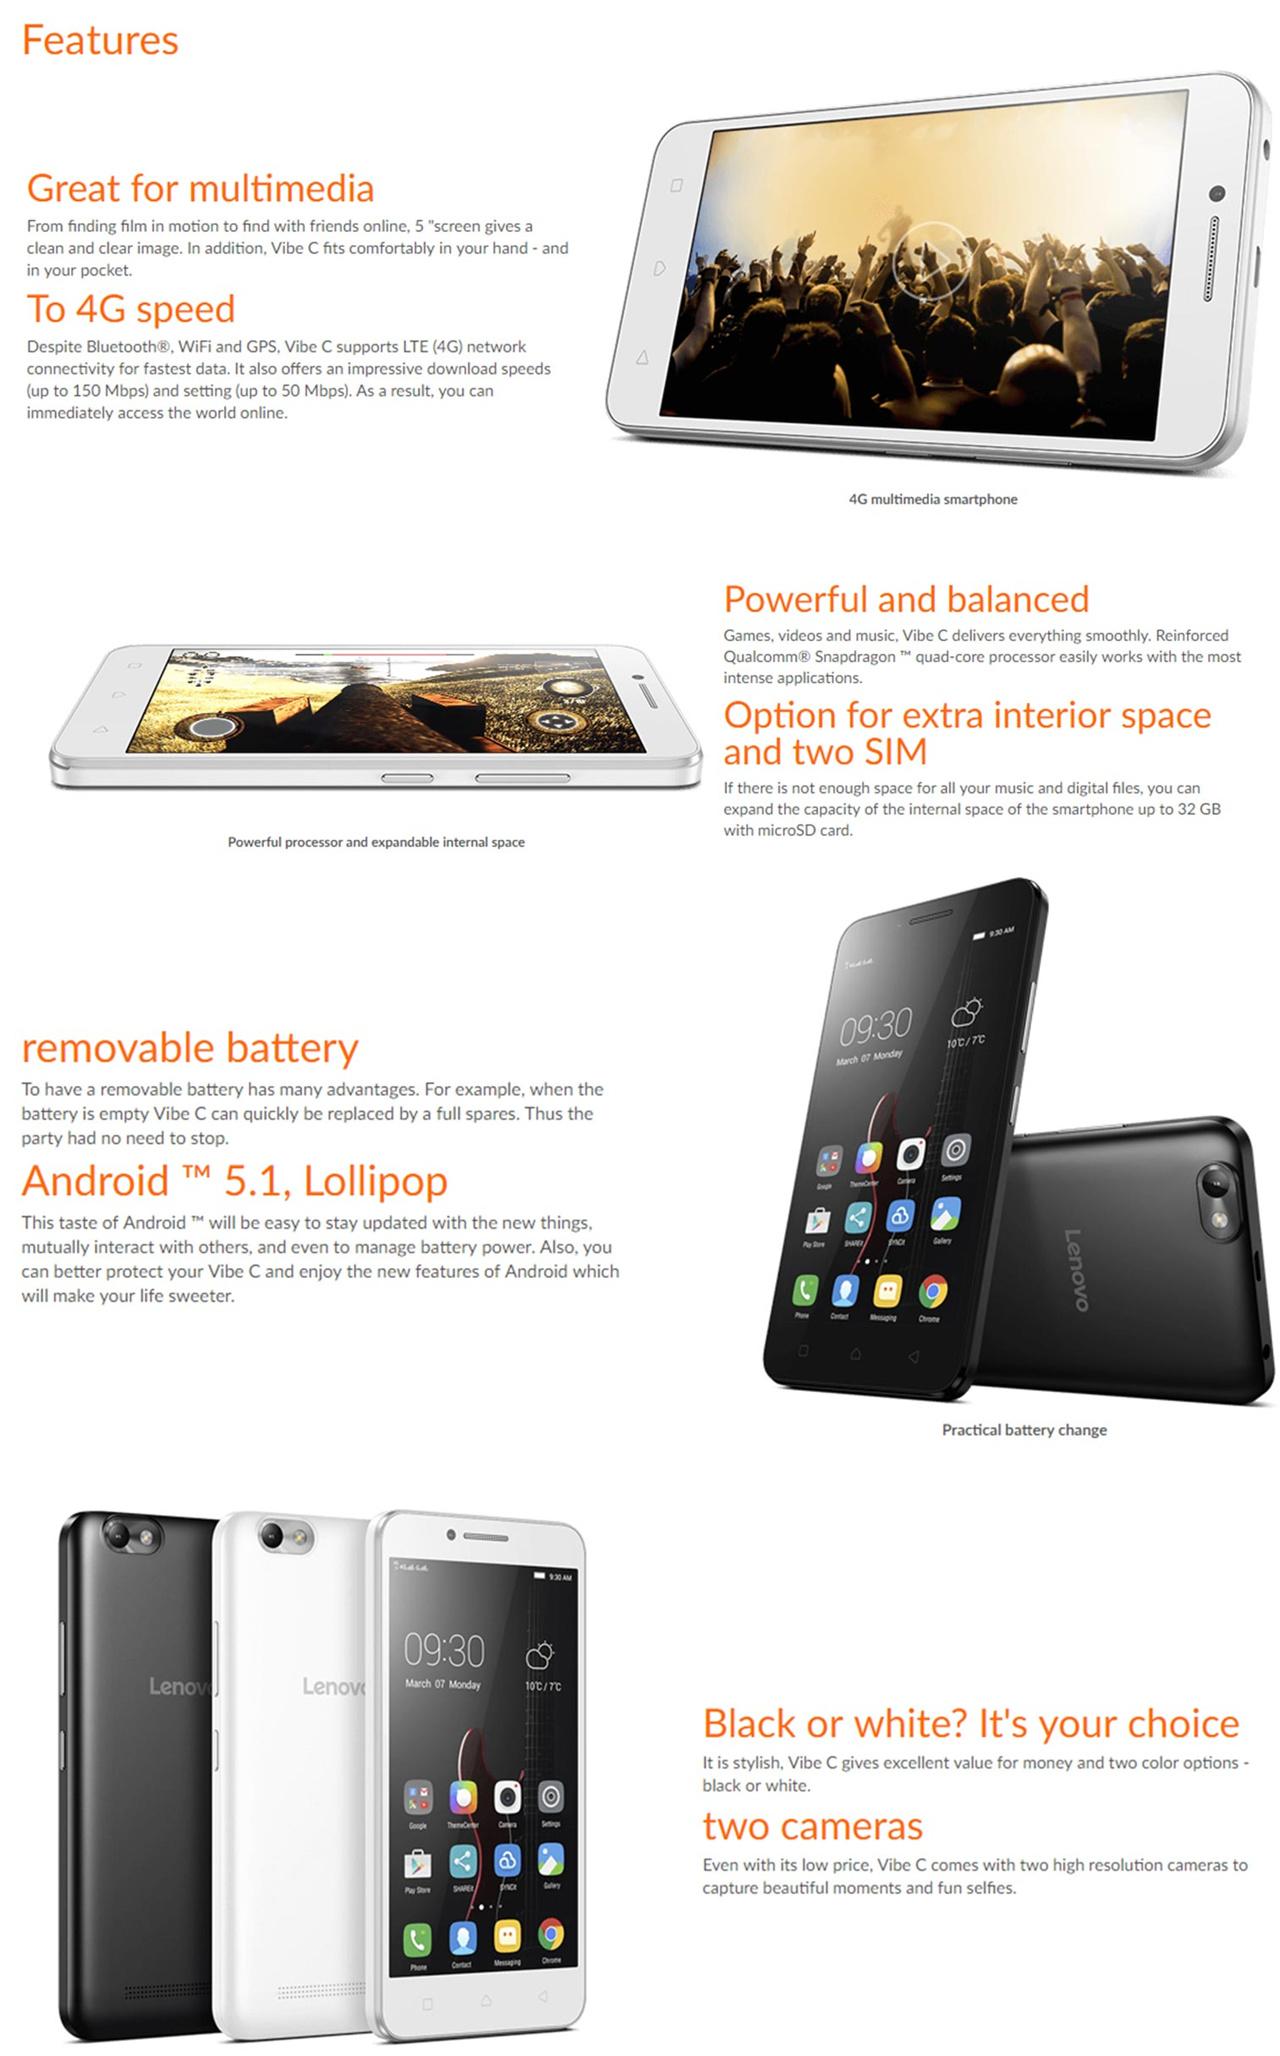 Buy Lenovo Vibe C A2020 1 Year Local Warranty Free Gift Back Cover White Processorqualcomm Snapdragon 210 Display50 Hd Ram1gb Rom 16gb Simdual Sim Rear 5mp Front 2mp